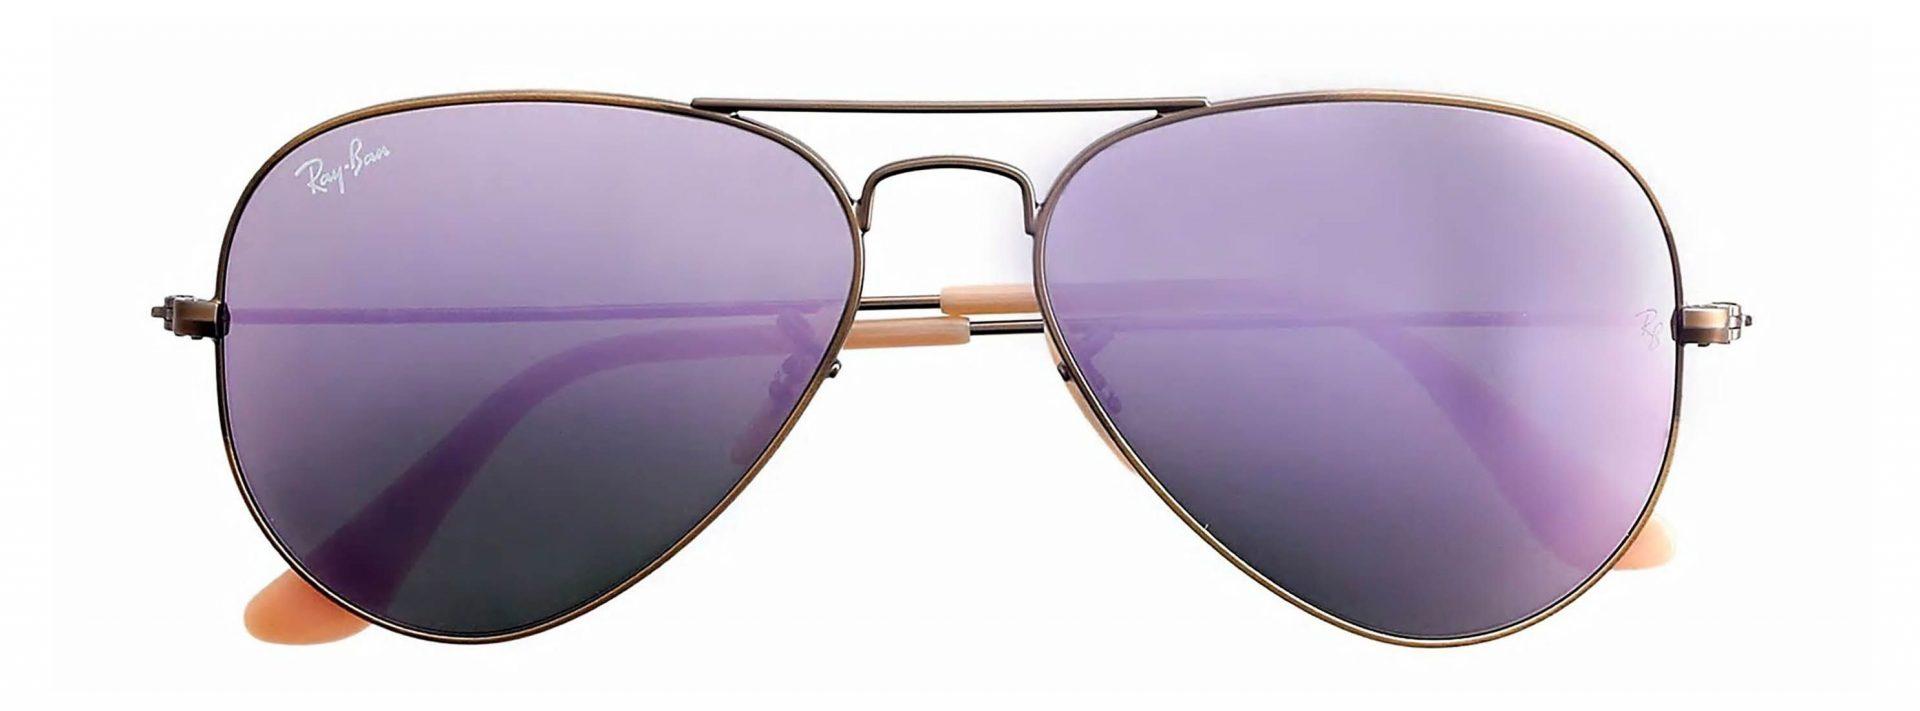 Ray-Ban Sunglasses Rb C5826 Ef3 2970x1100